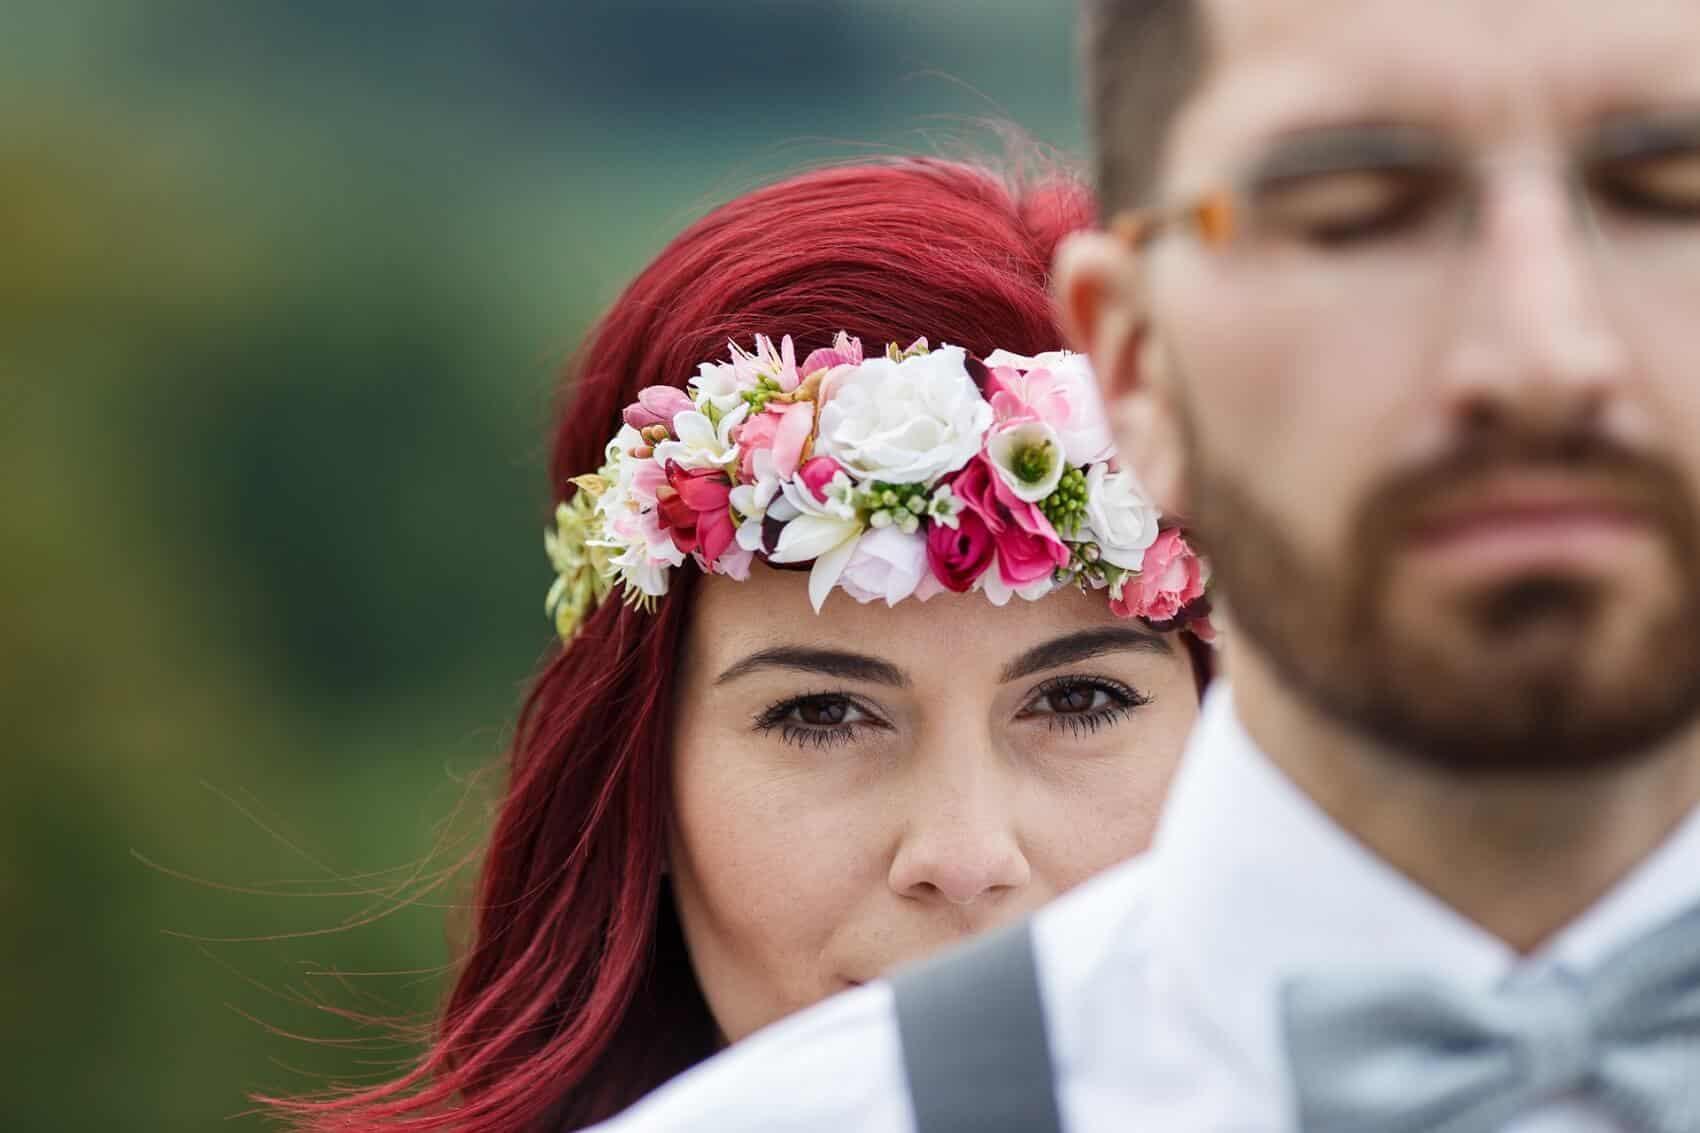 Fotograf Radek Vandra detail novomanželů